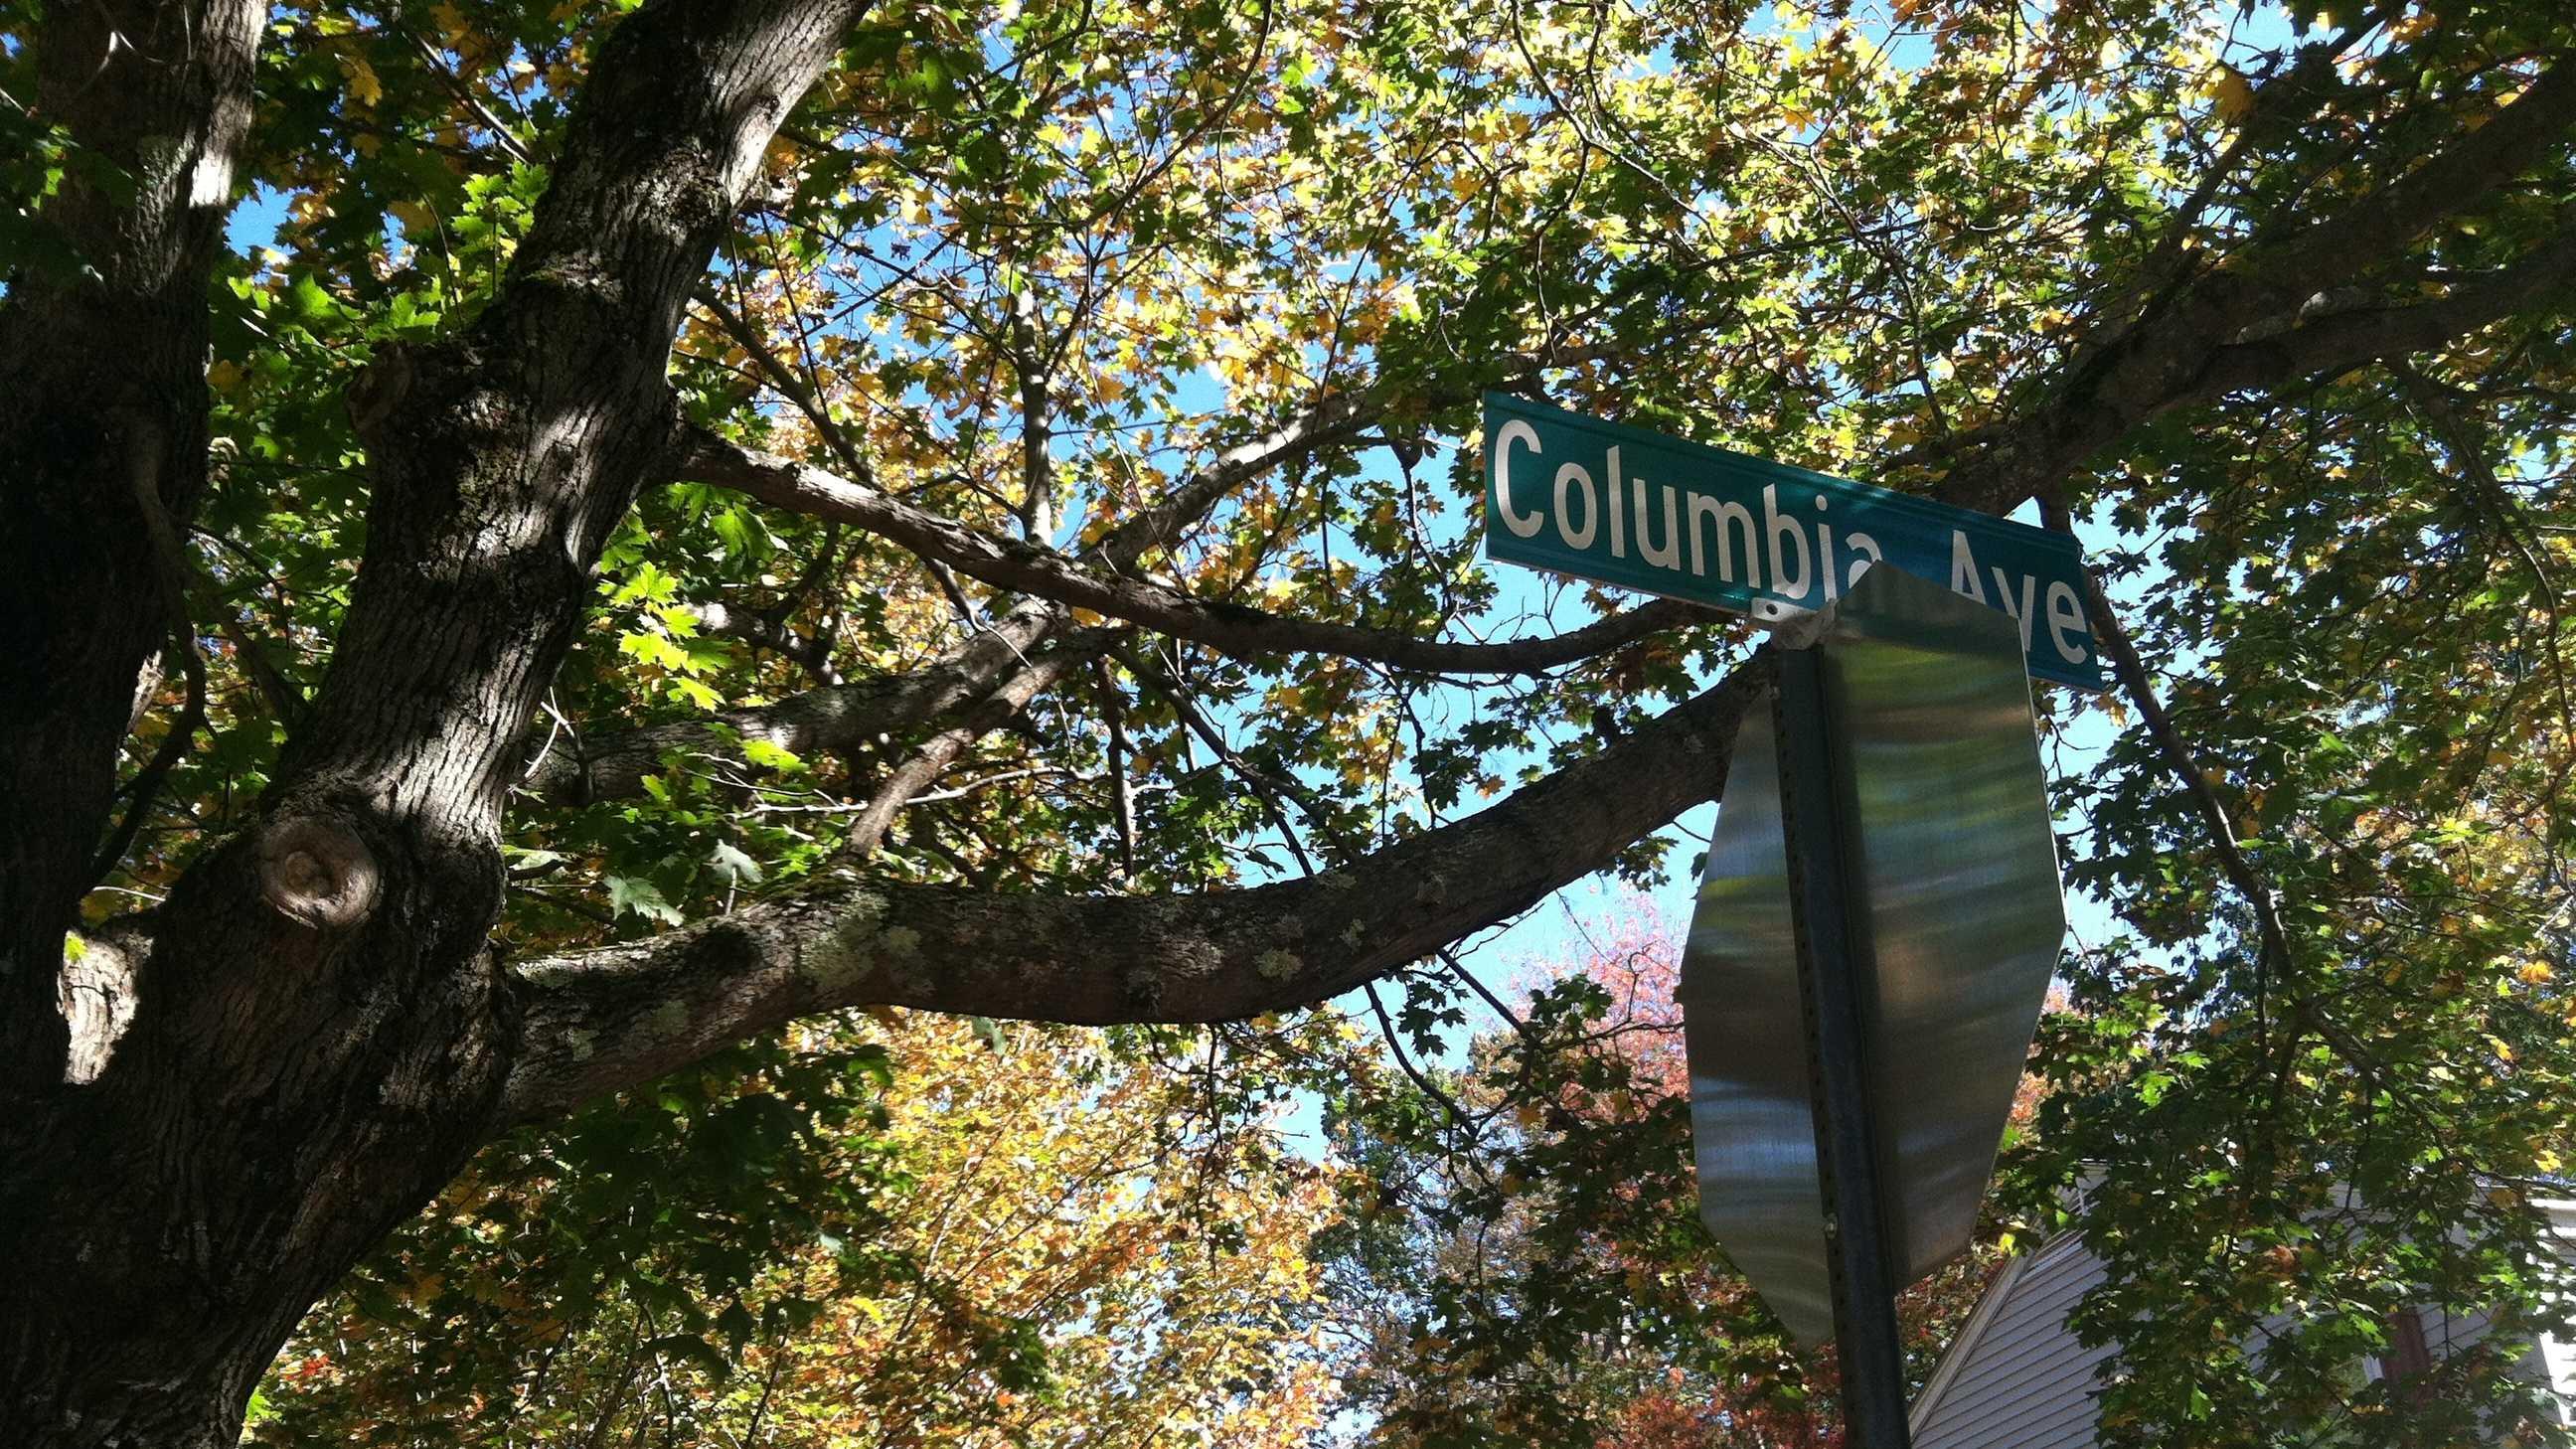 Columbia Ave Brunswick.JPG